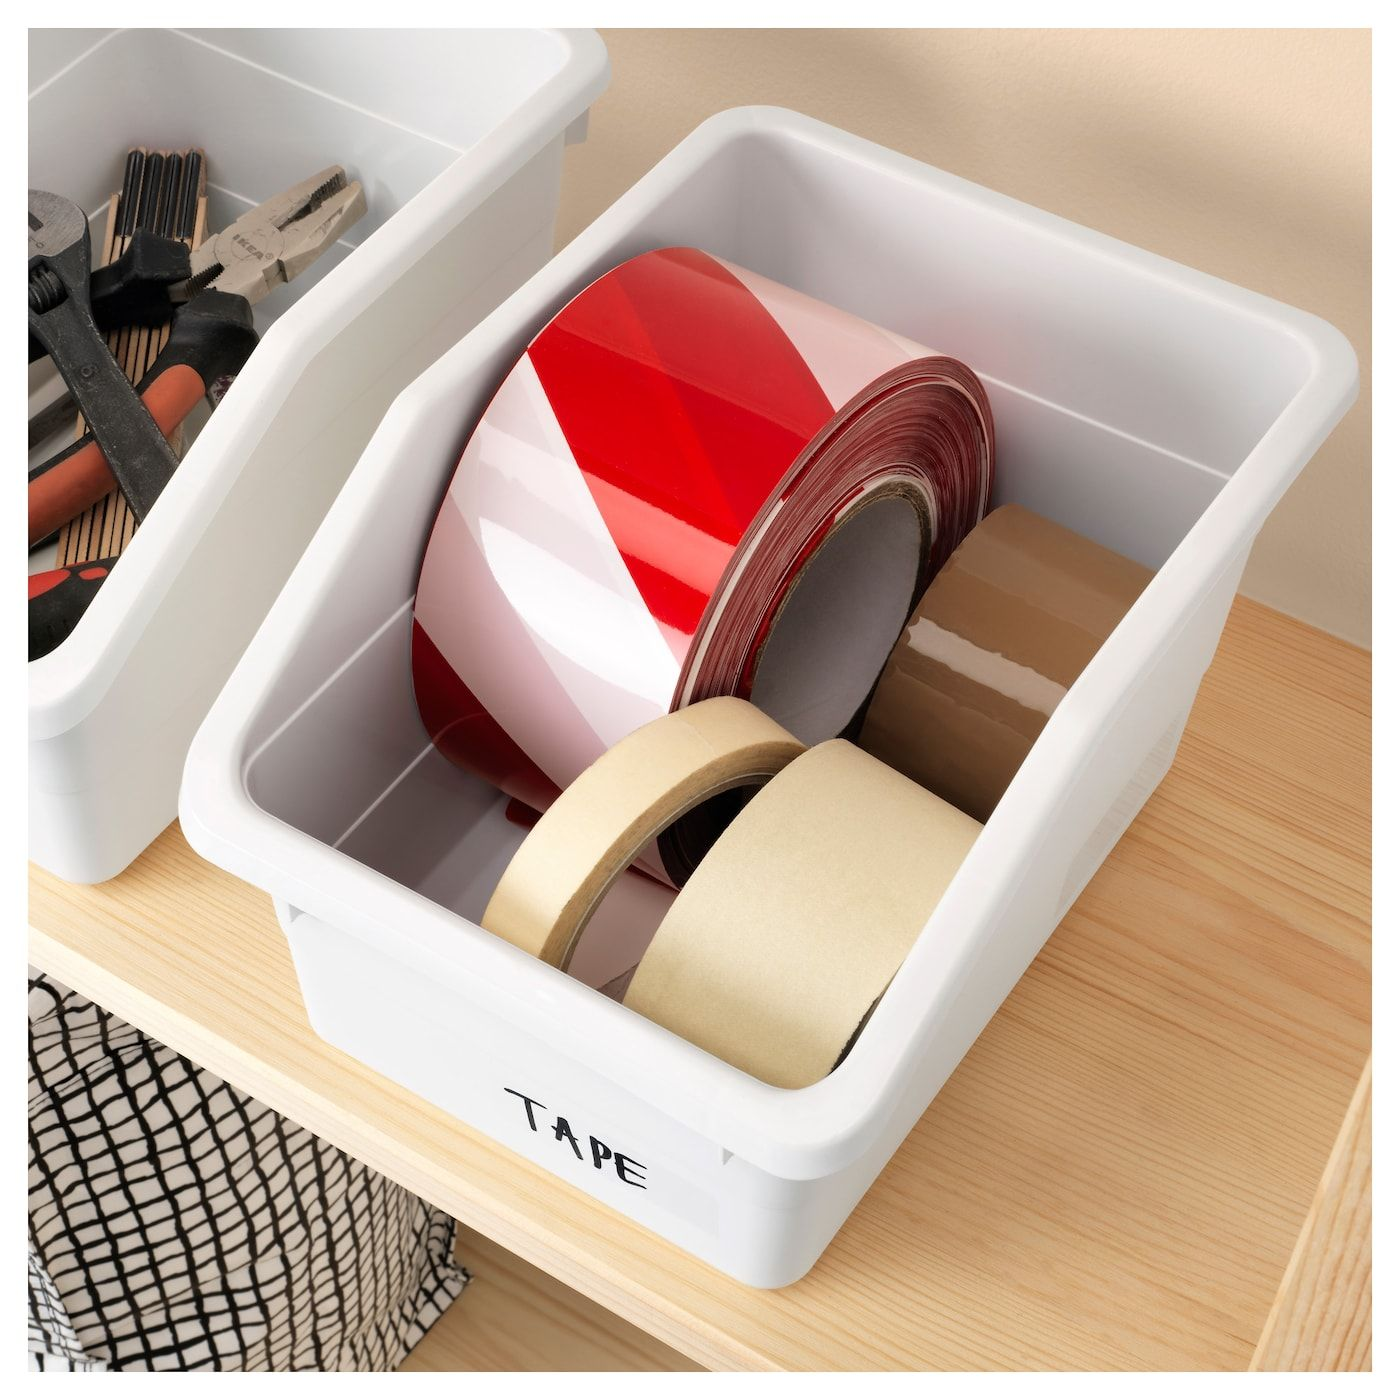 "SOCKERBIT Box white 7 ½x10 ¼x6 "" (19x26x15 cm) Ikea"